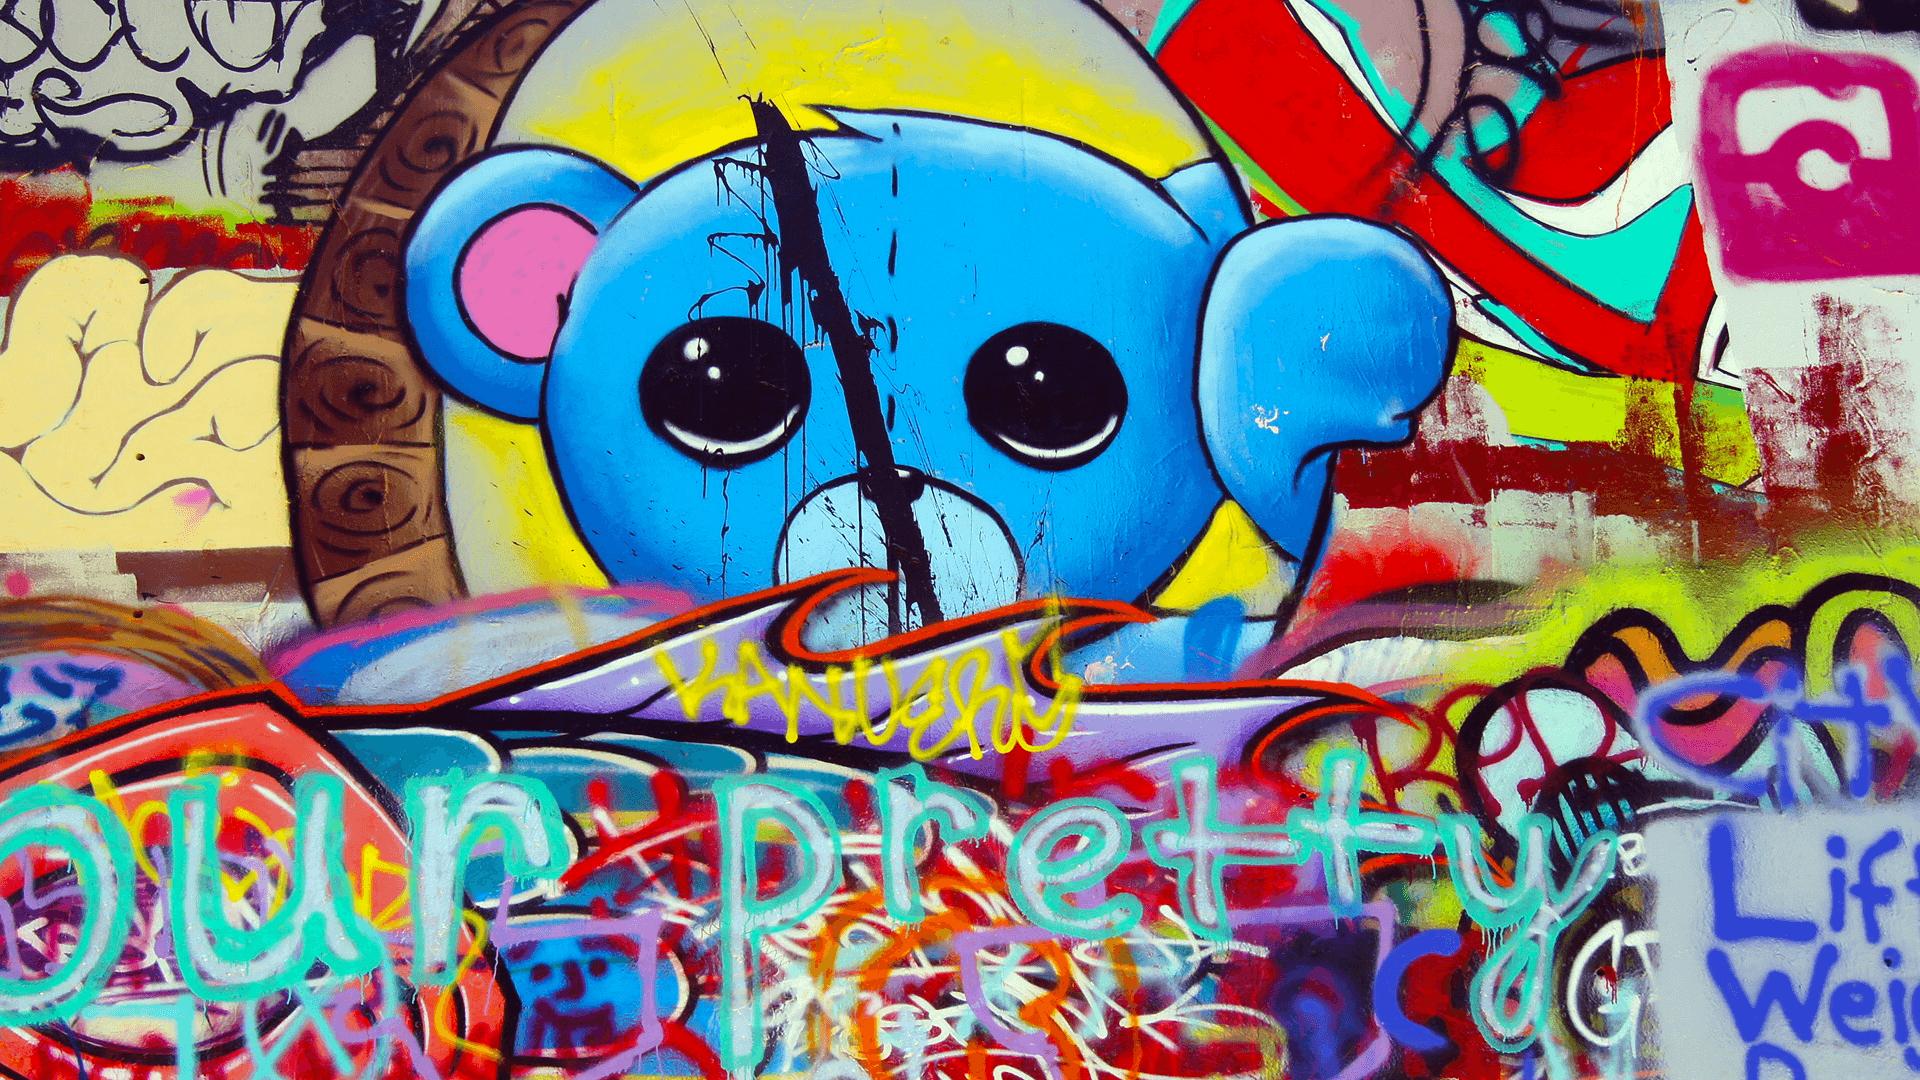 graffiti artwork pictures